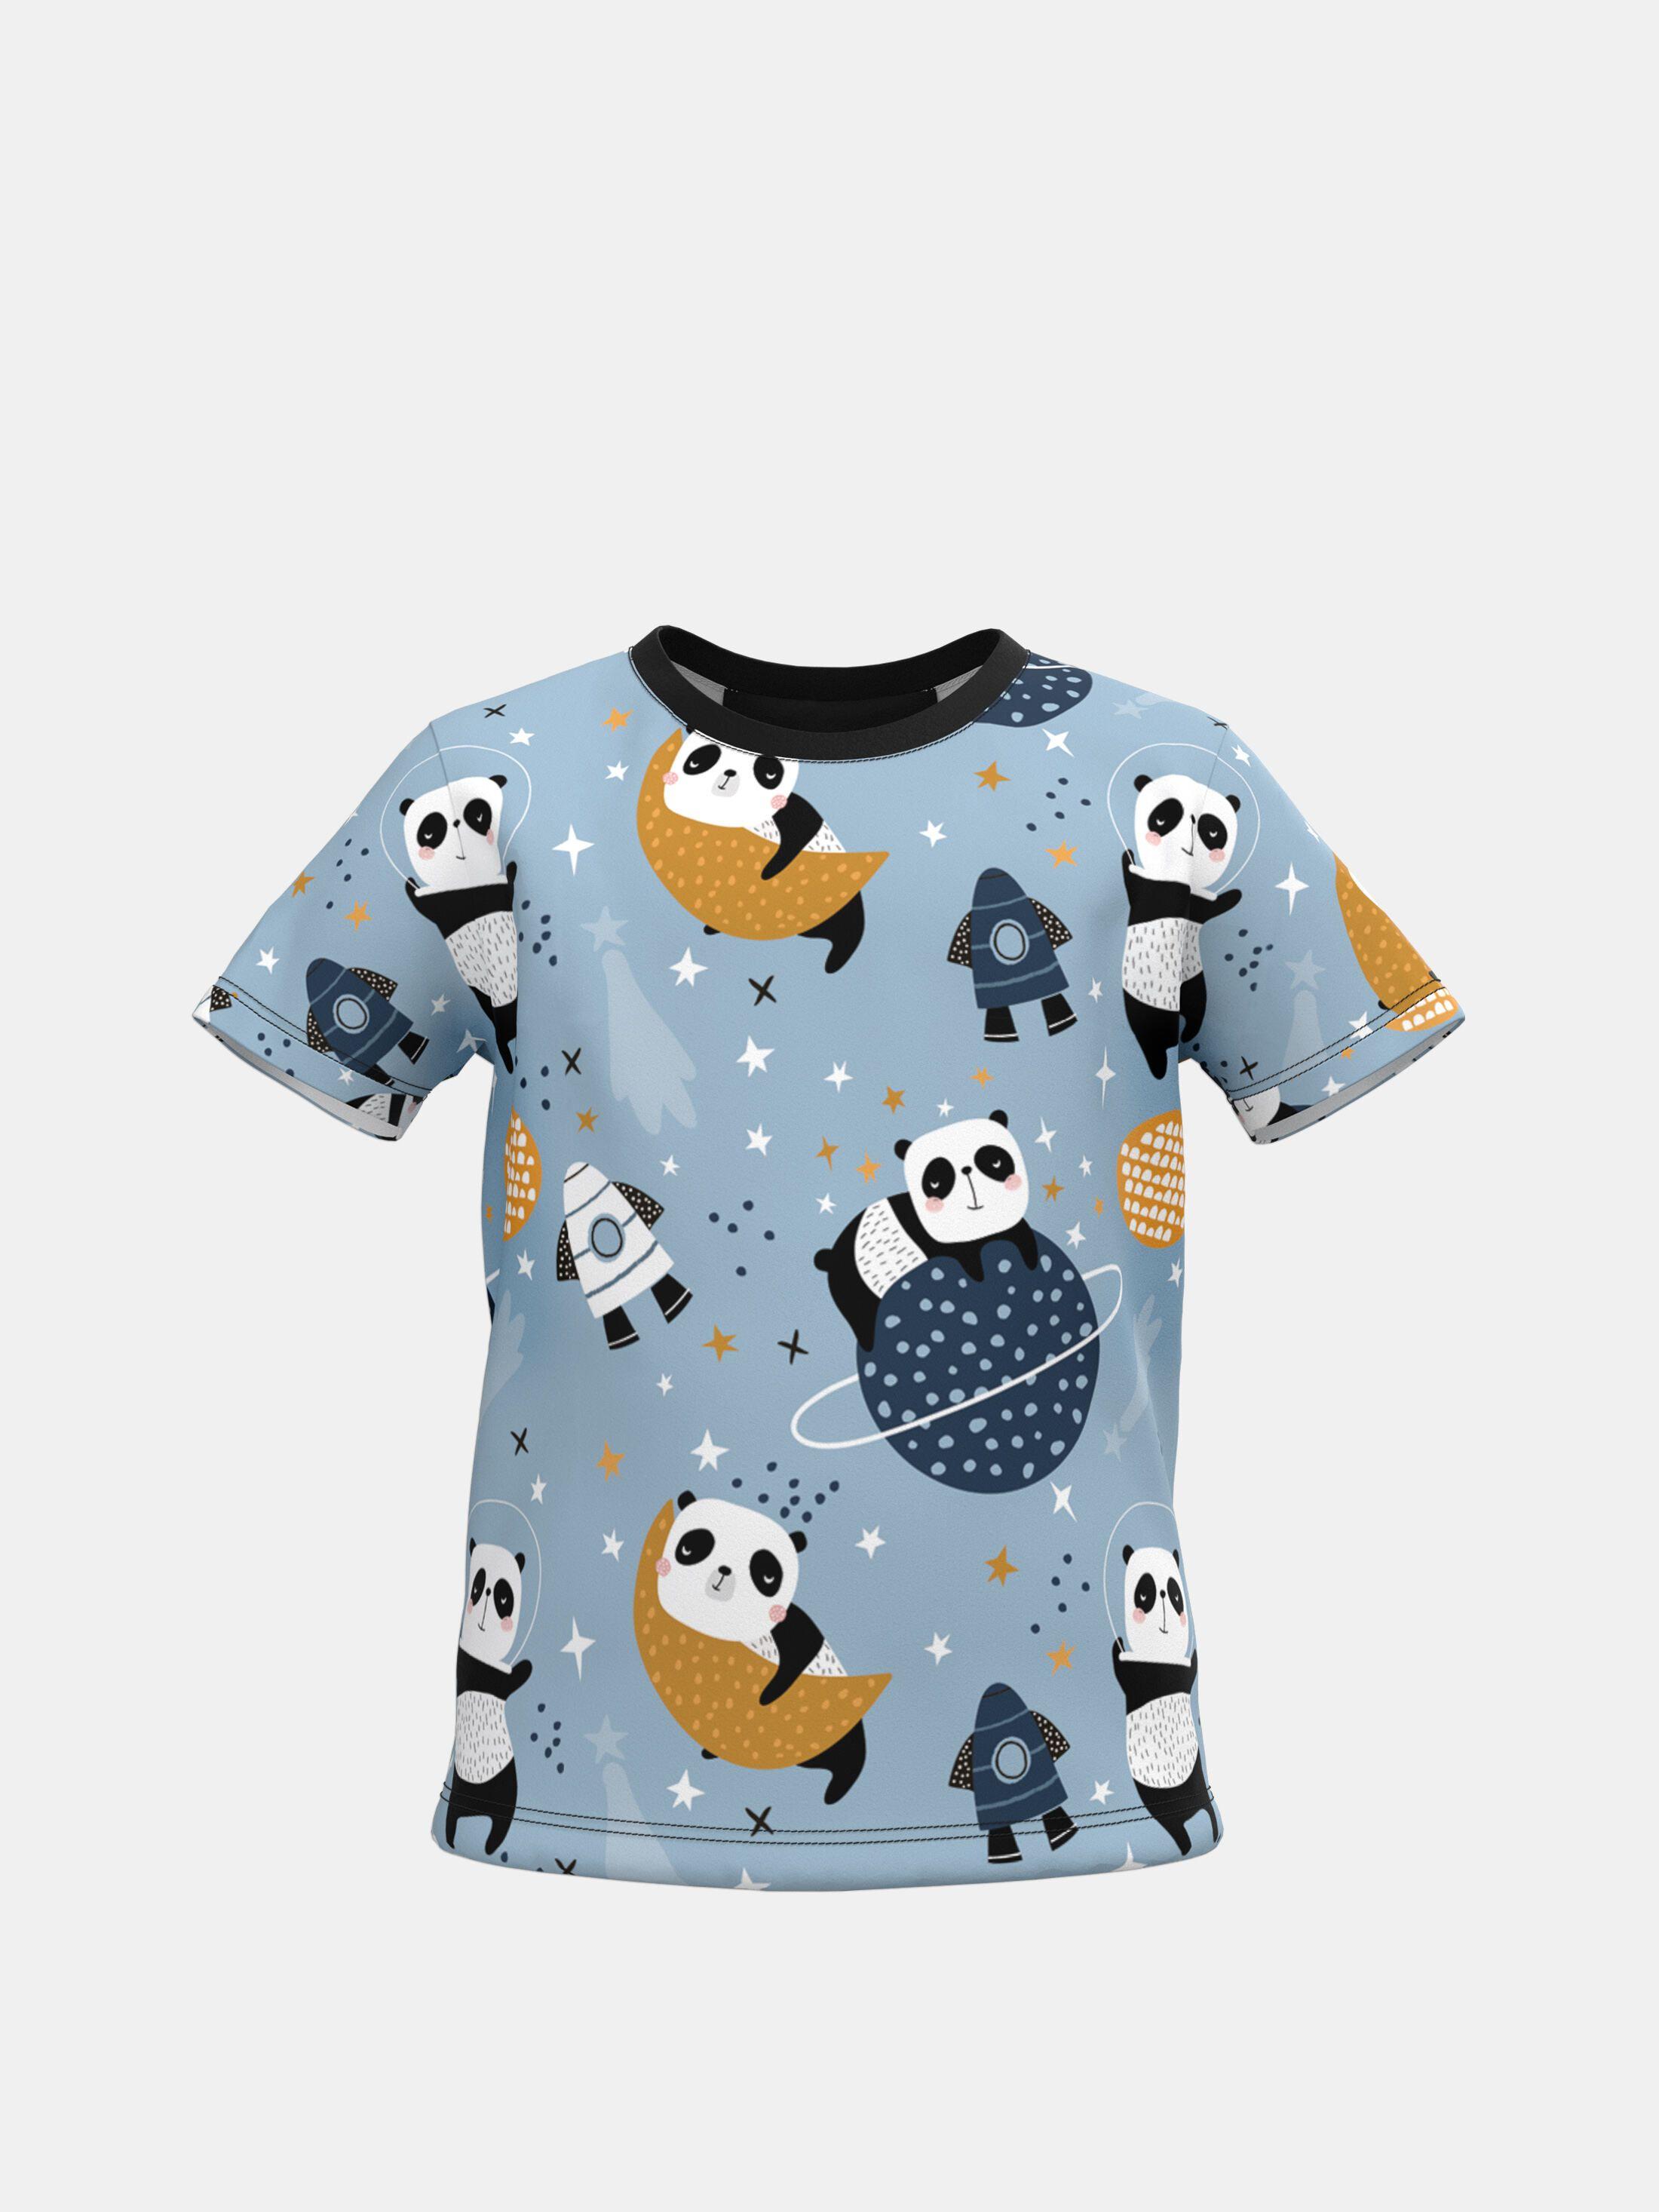 printed childrens t shirts handmade